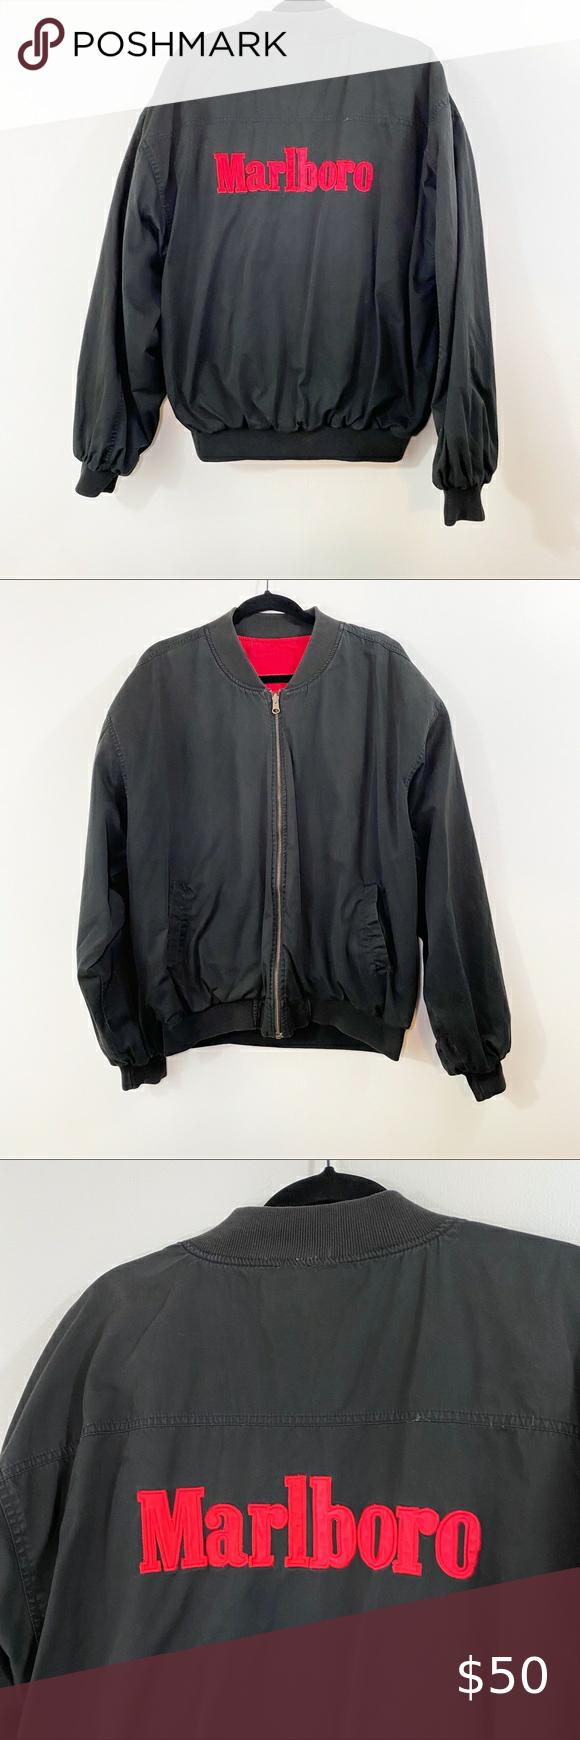 Marlboro Vintage Reversible 90 S Bomber Jacket In 2020 Bomber Jacket Marlboro Jacket Jackets